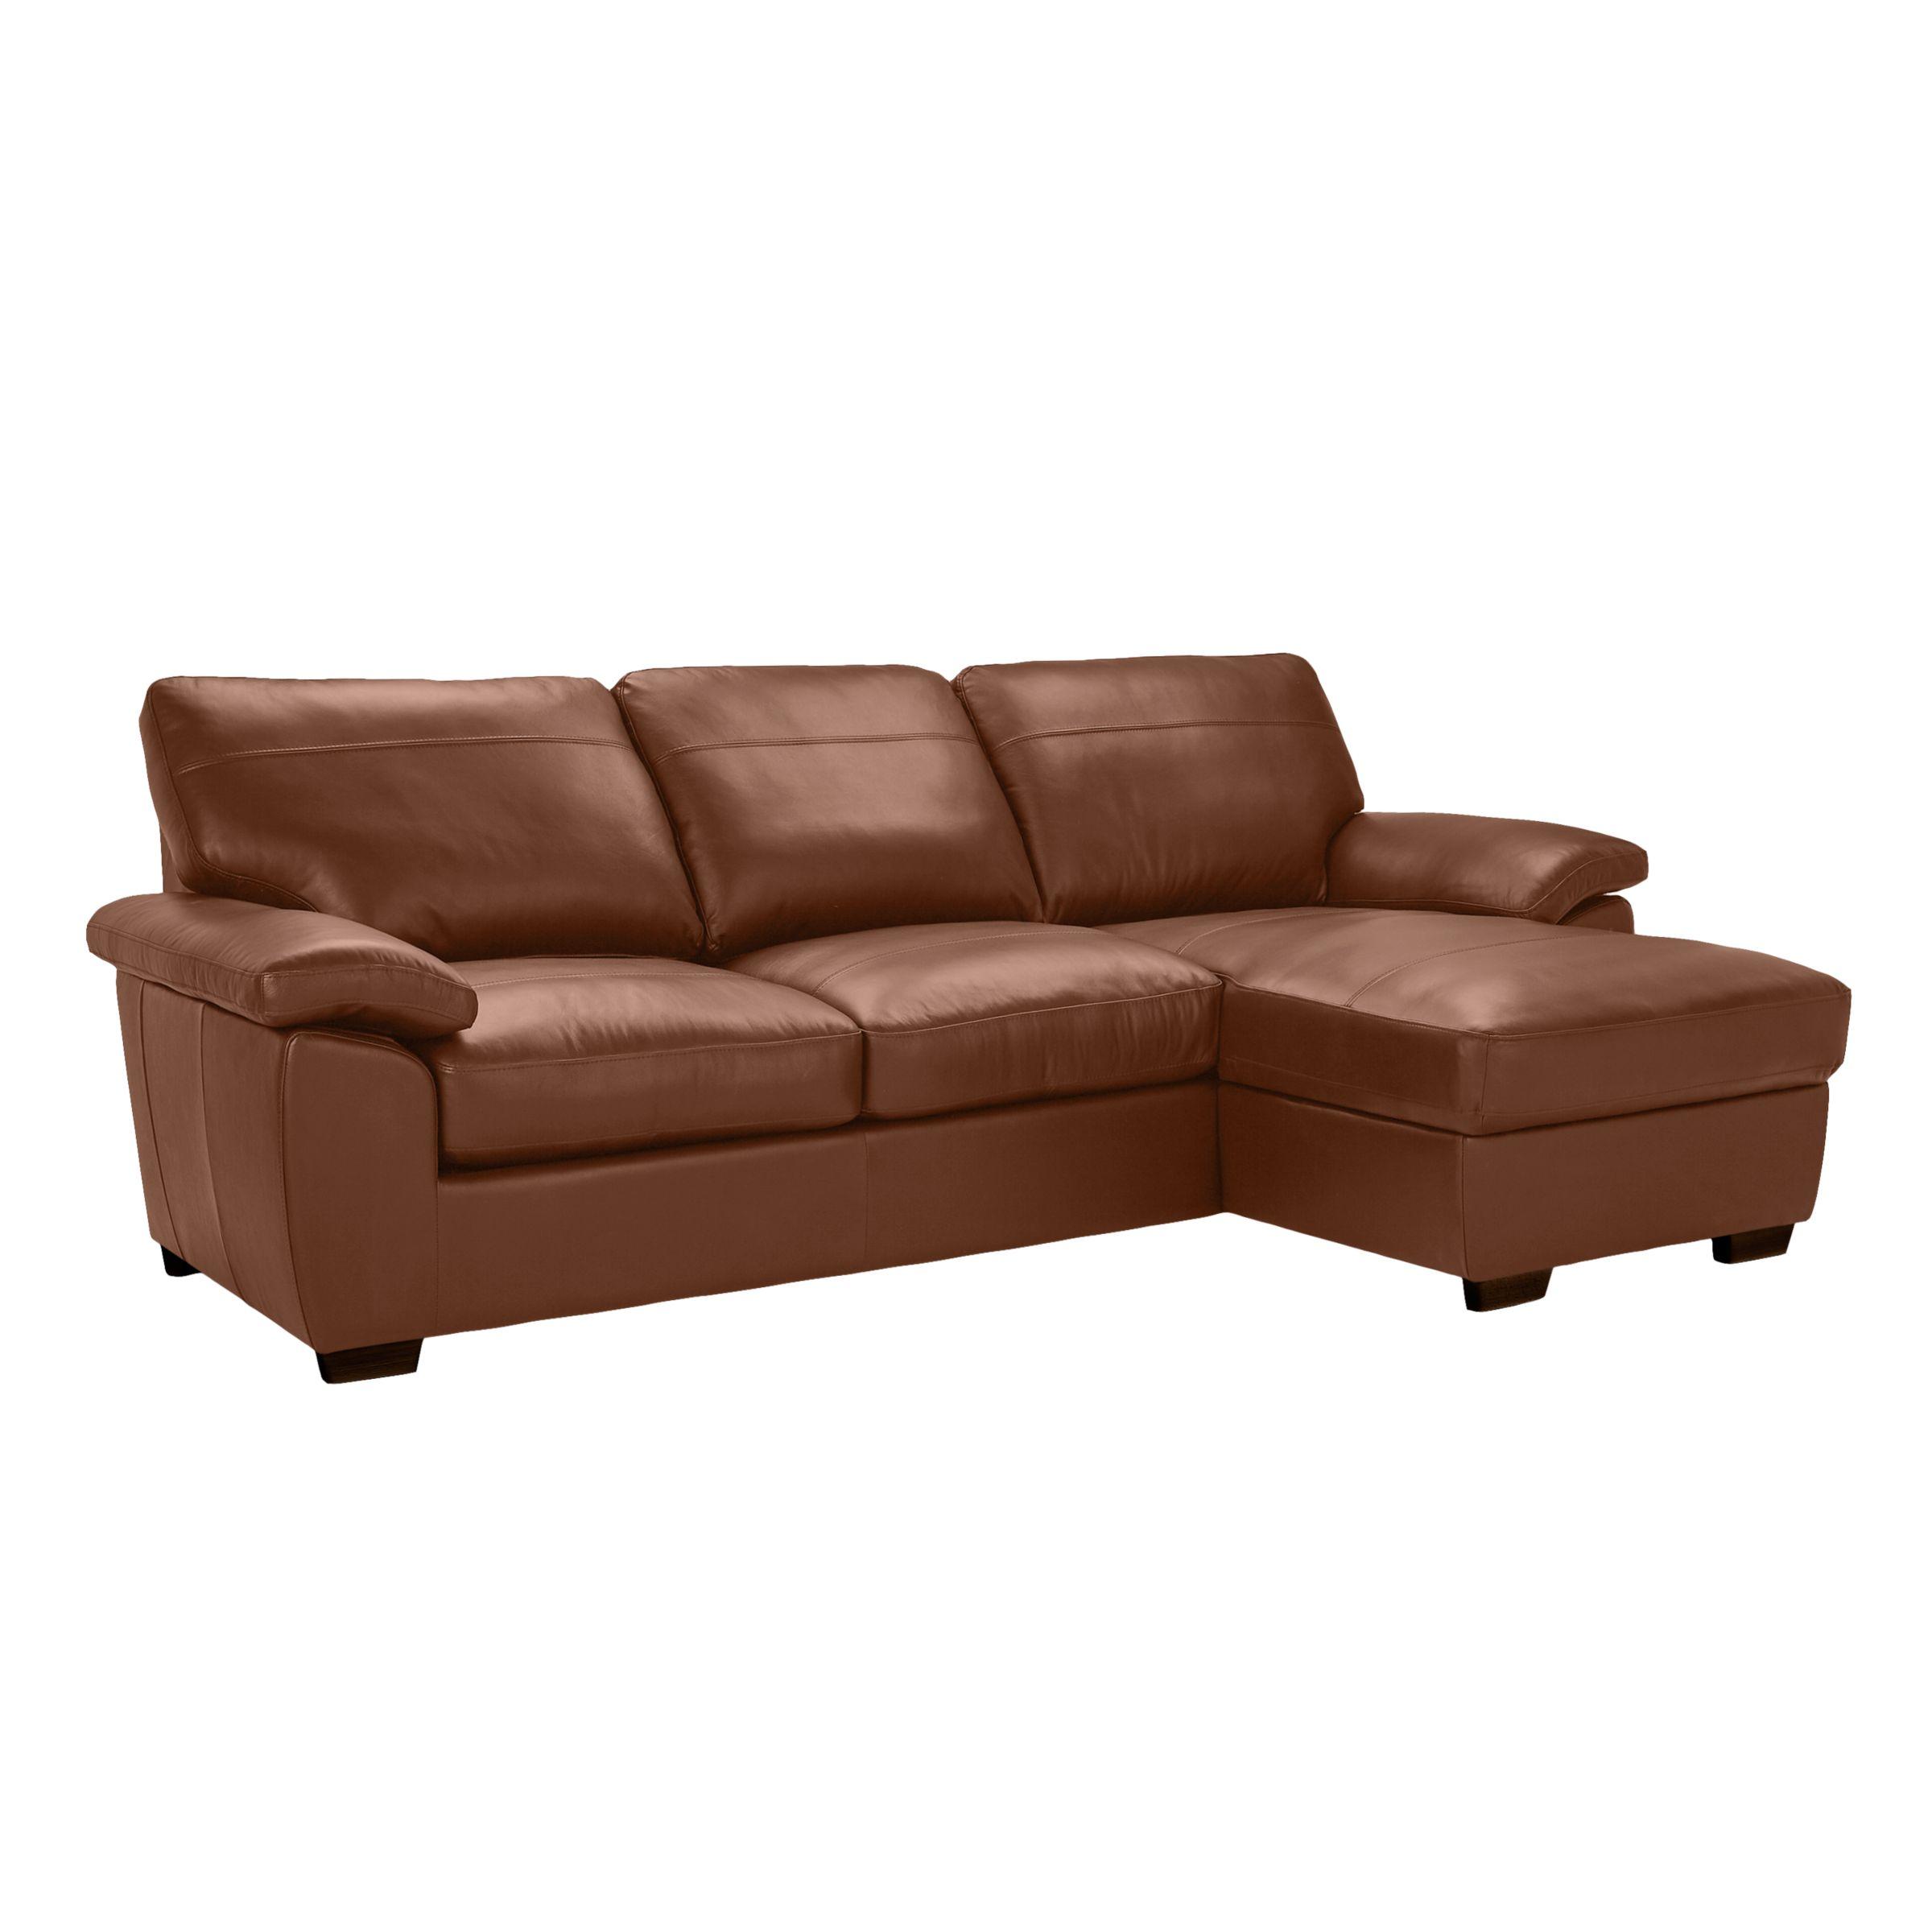 camden sofa john lewis framework github and partners leather medium bed with